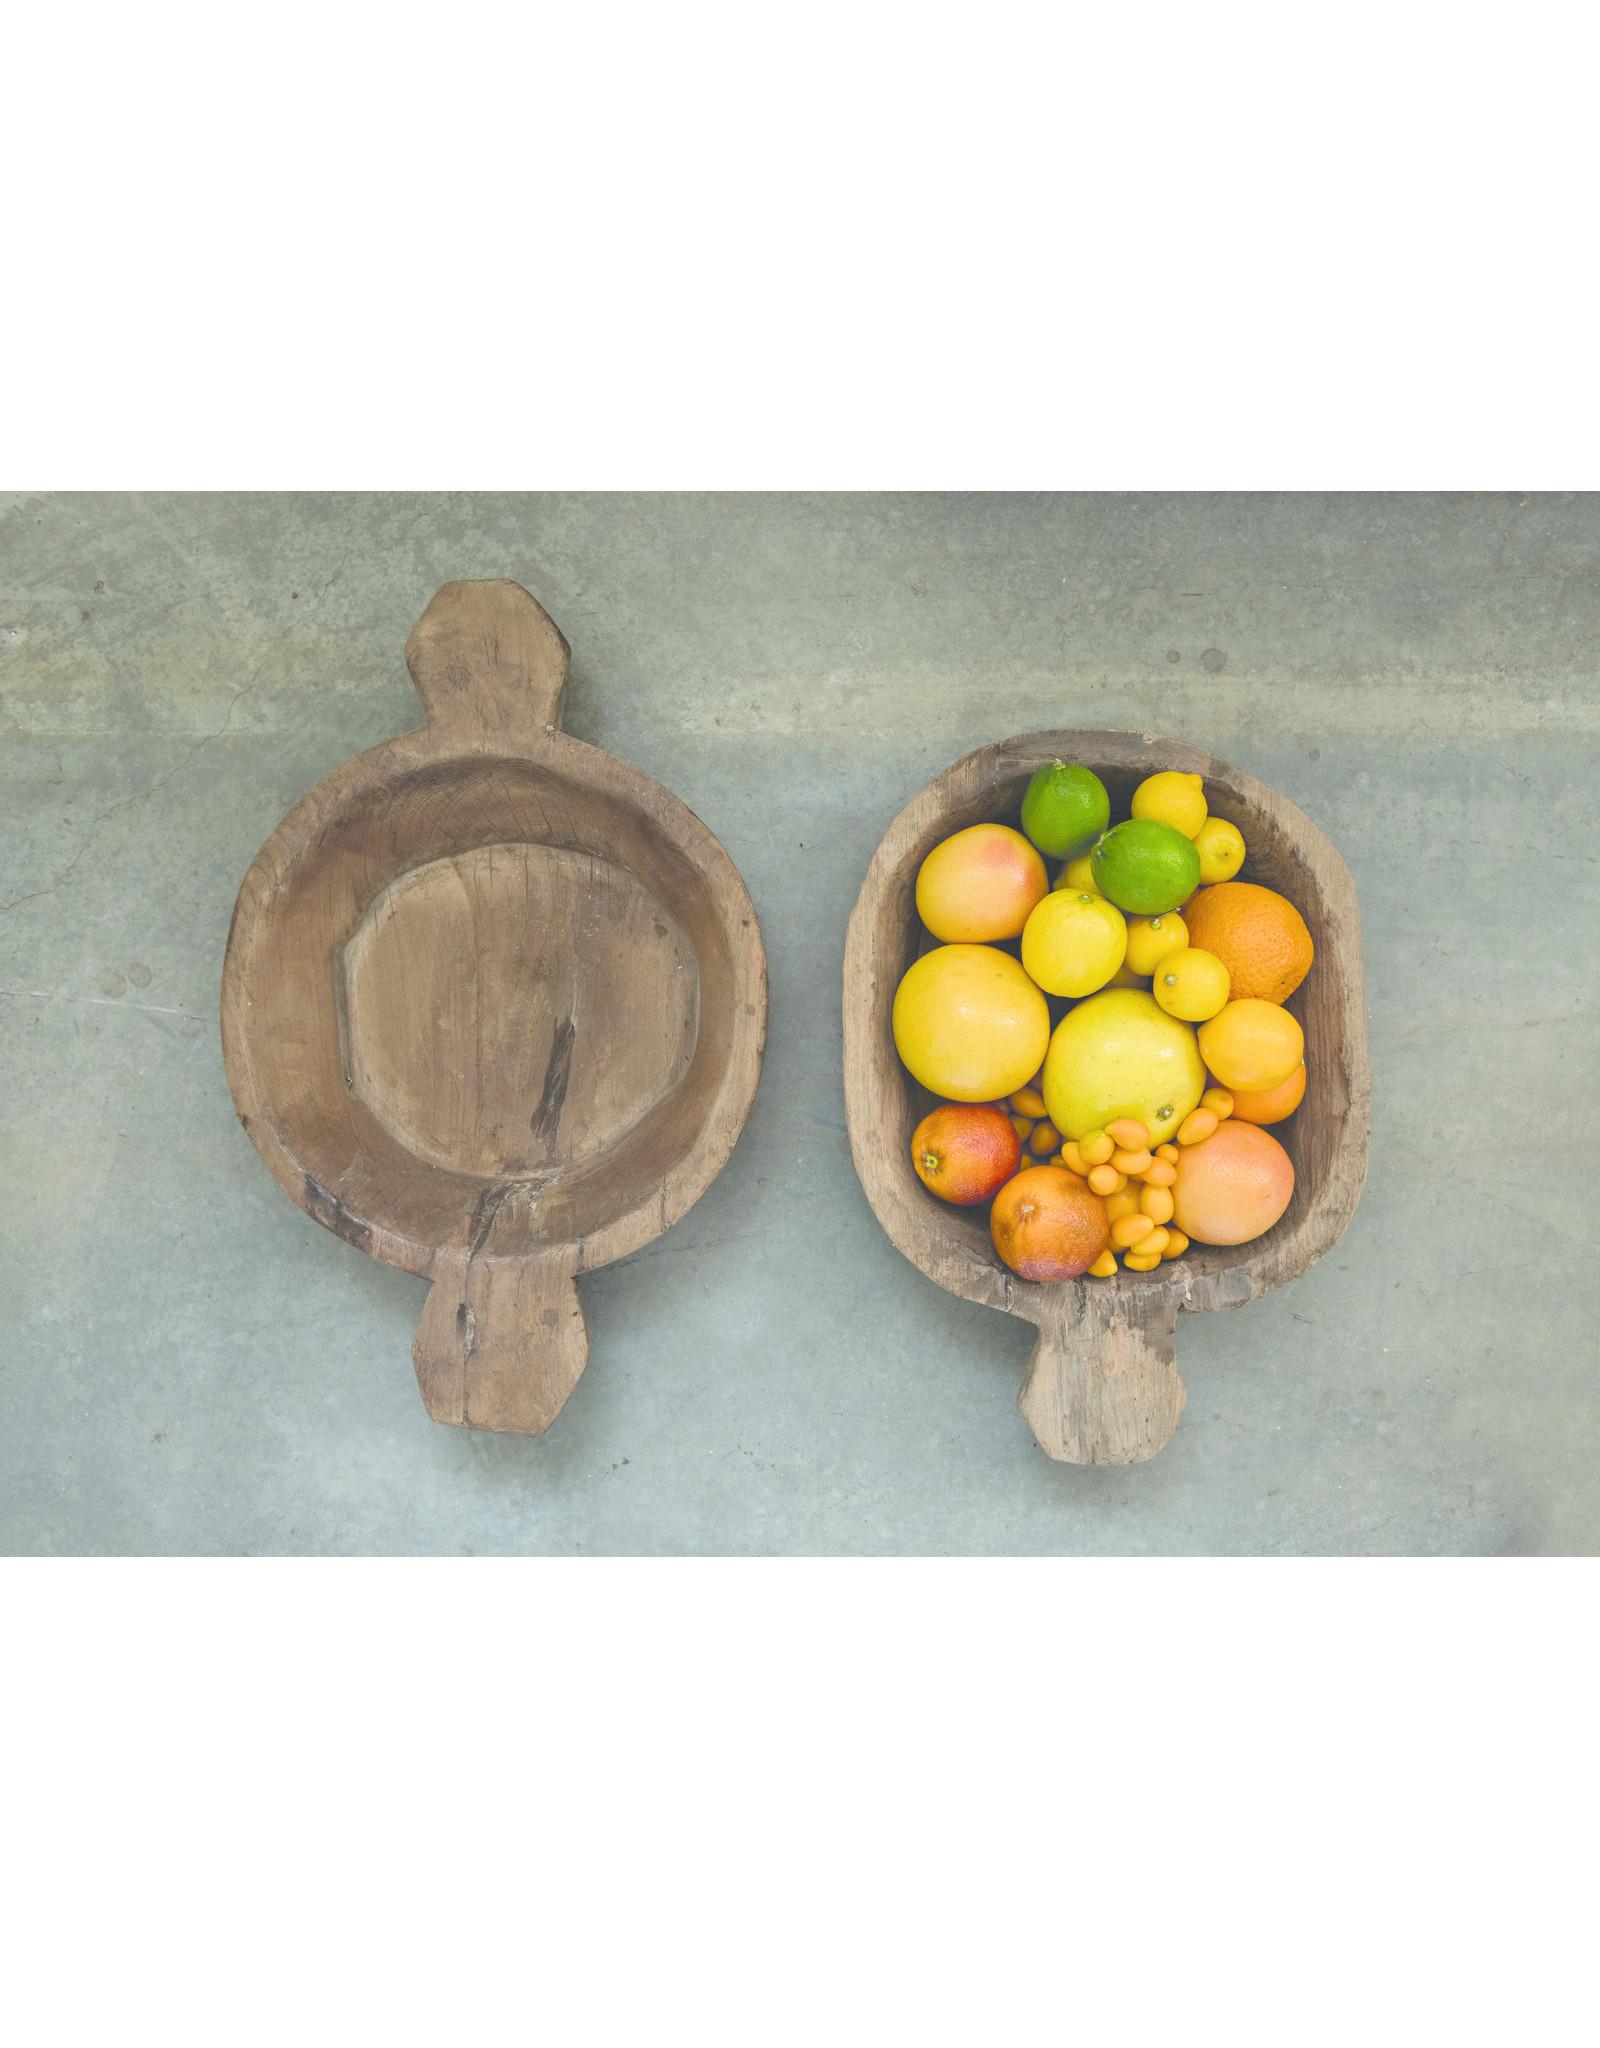 Website Found Decorative Wood Bowl